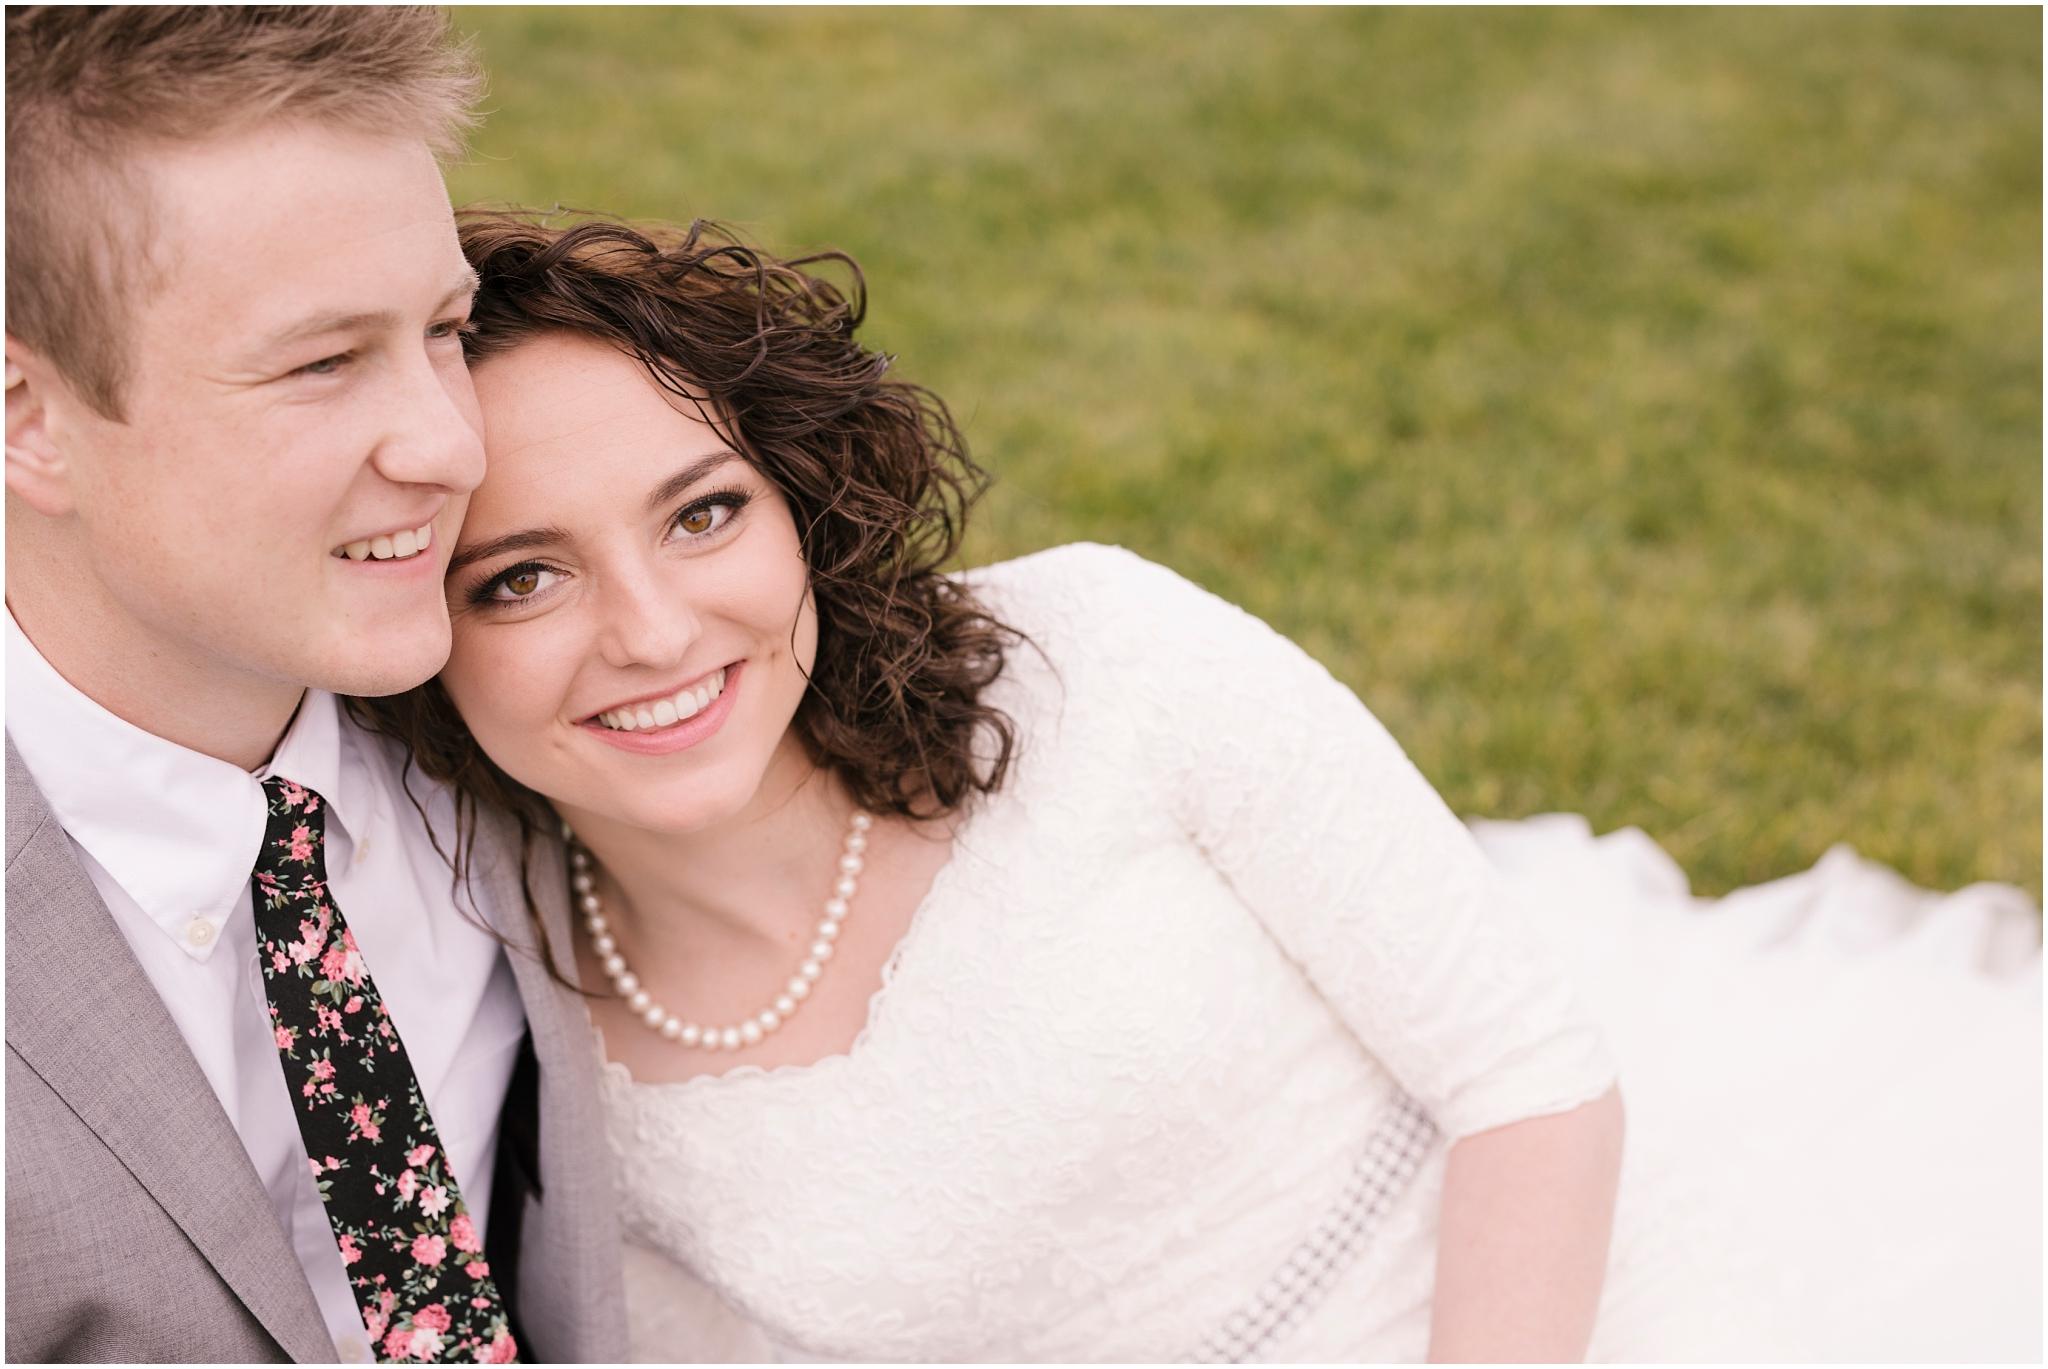 BA-Bridals-37_Lizzie-B-Imagery-Utah-Wedding-Photographer-Central-Utah-Photographer-Utah-County-Manti-Utah-Temple.jpg